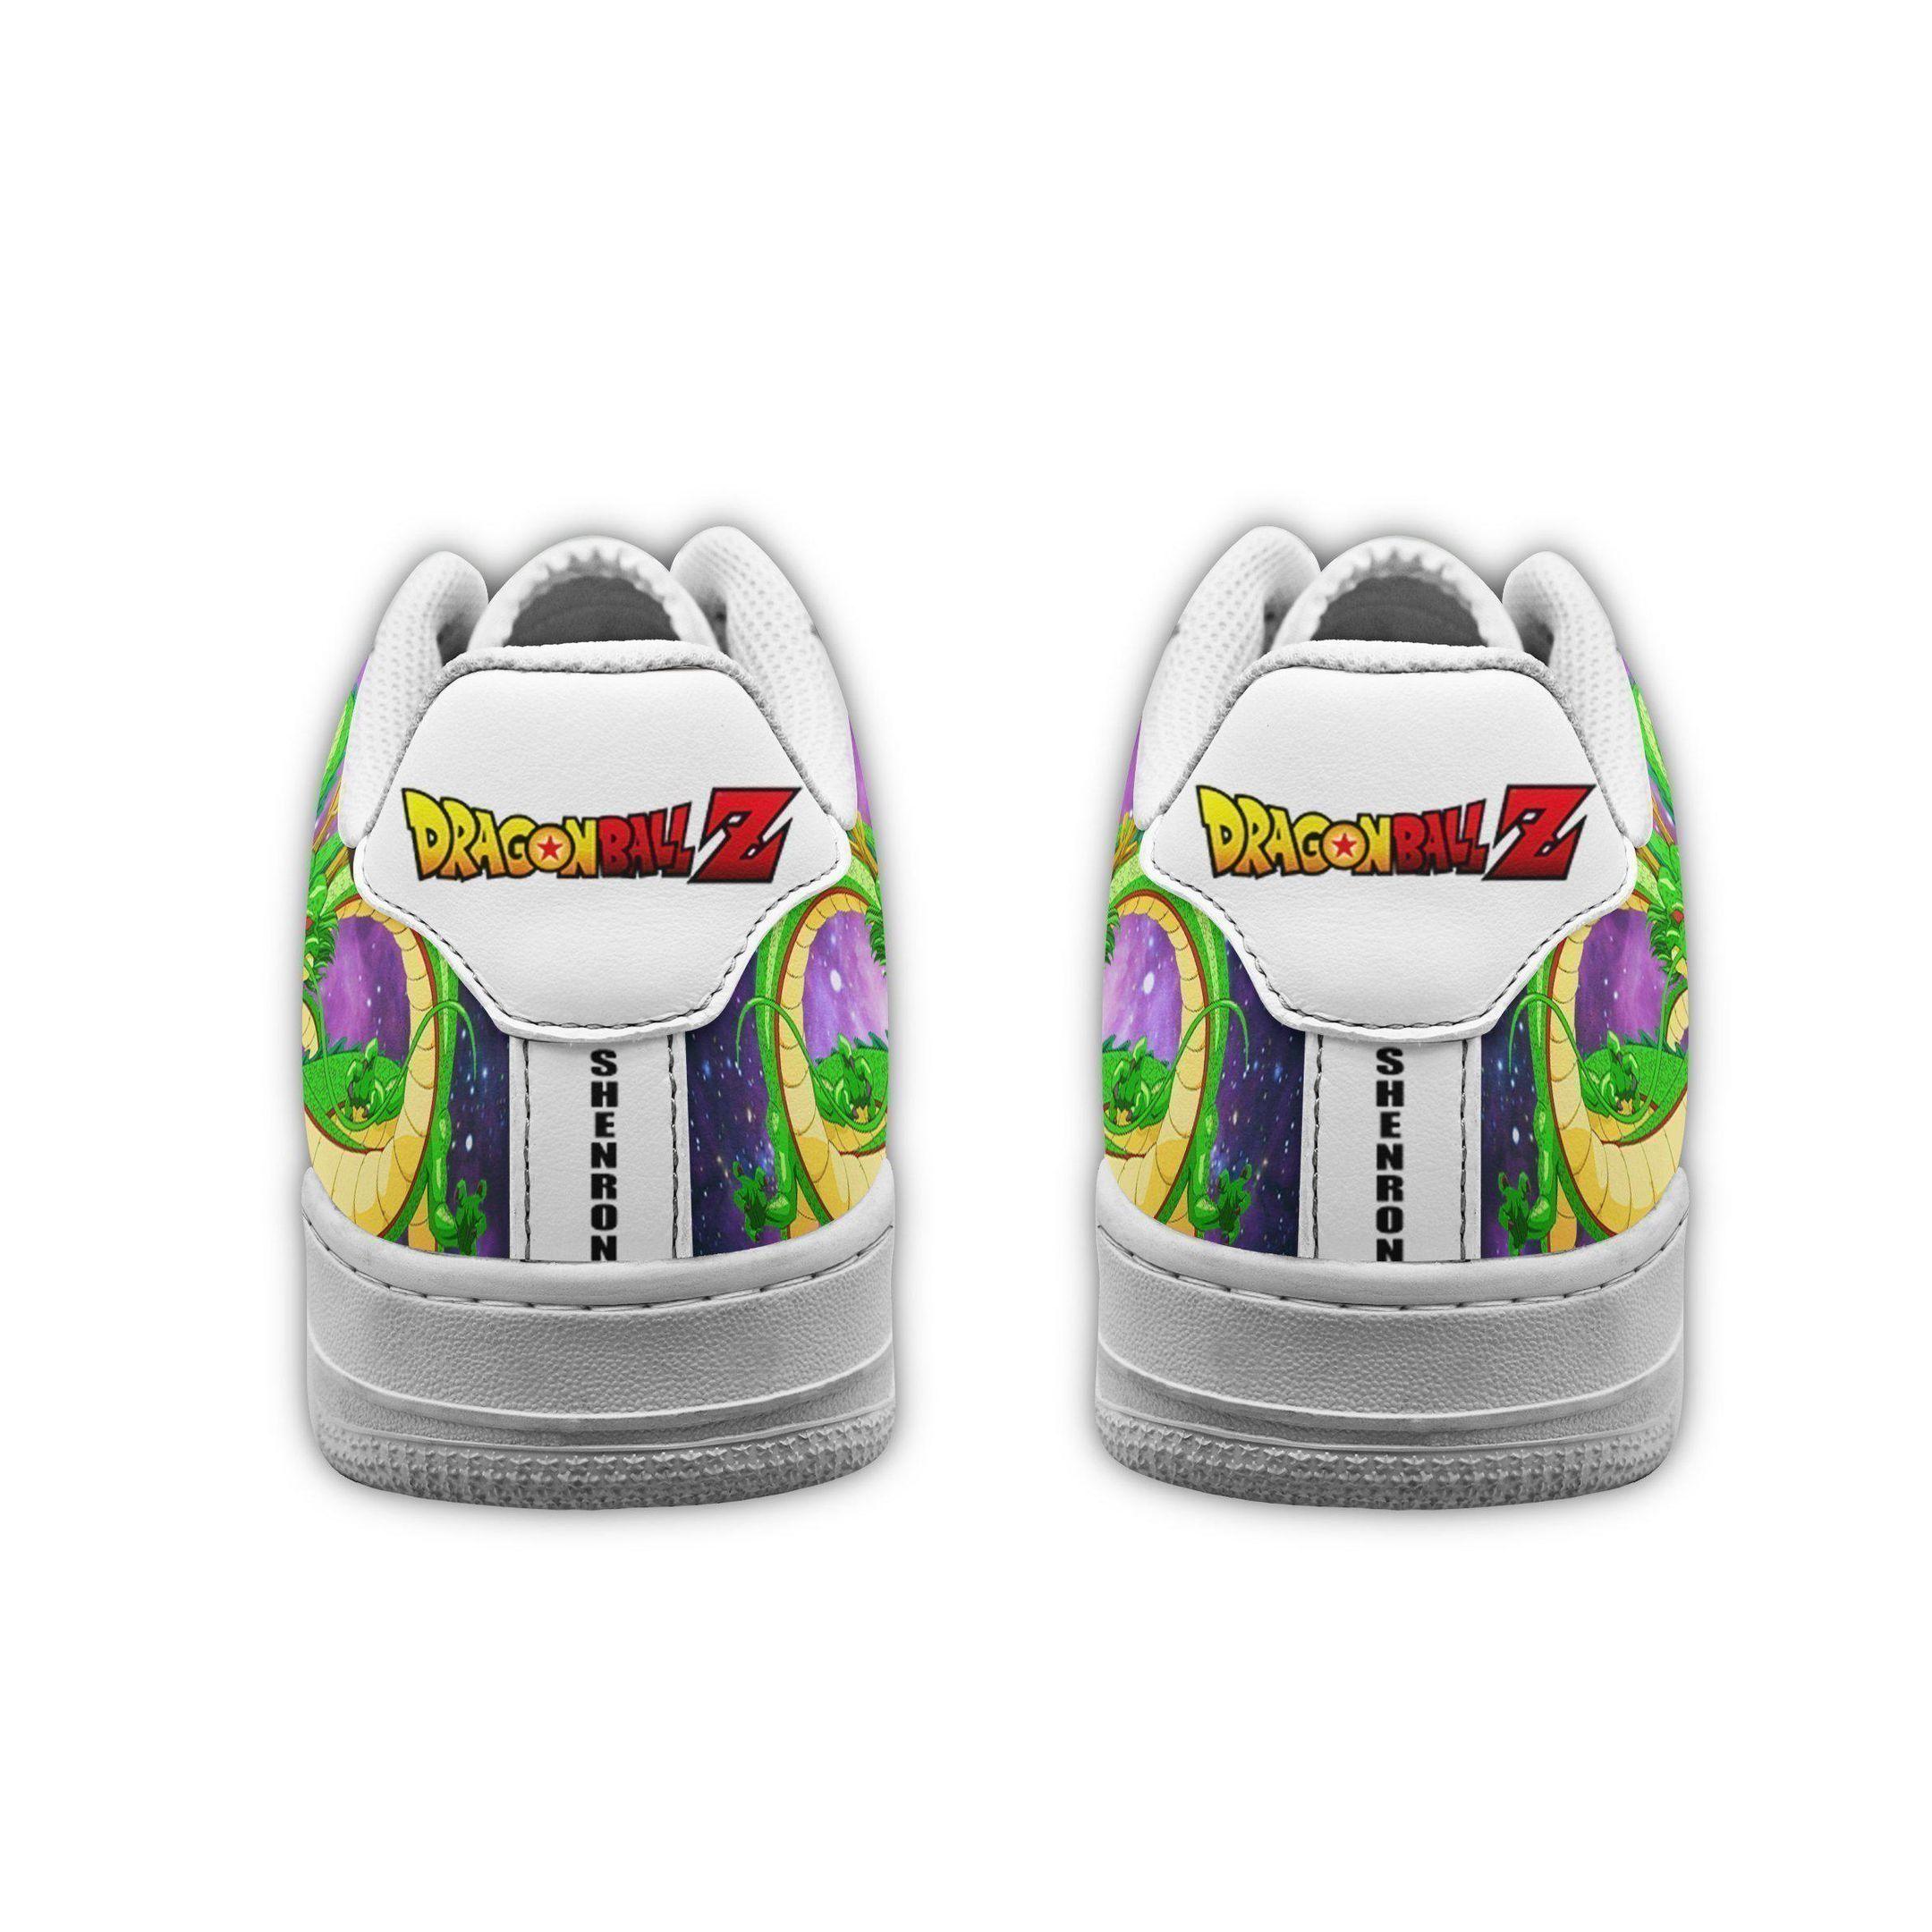 Shenron Air Shoes Dragon Ball Z Anime Shoes Fan Gift GO1012